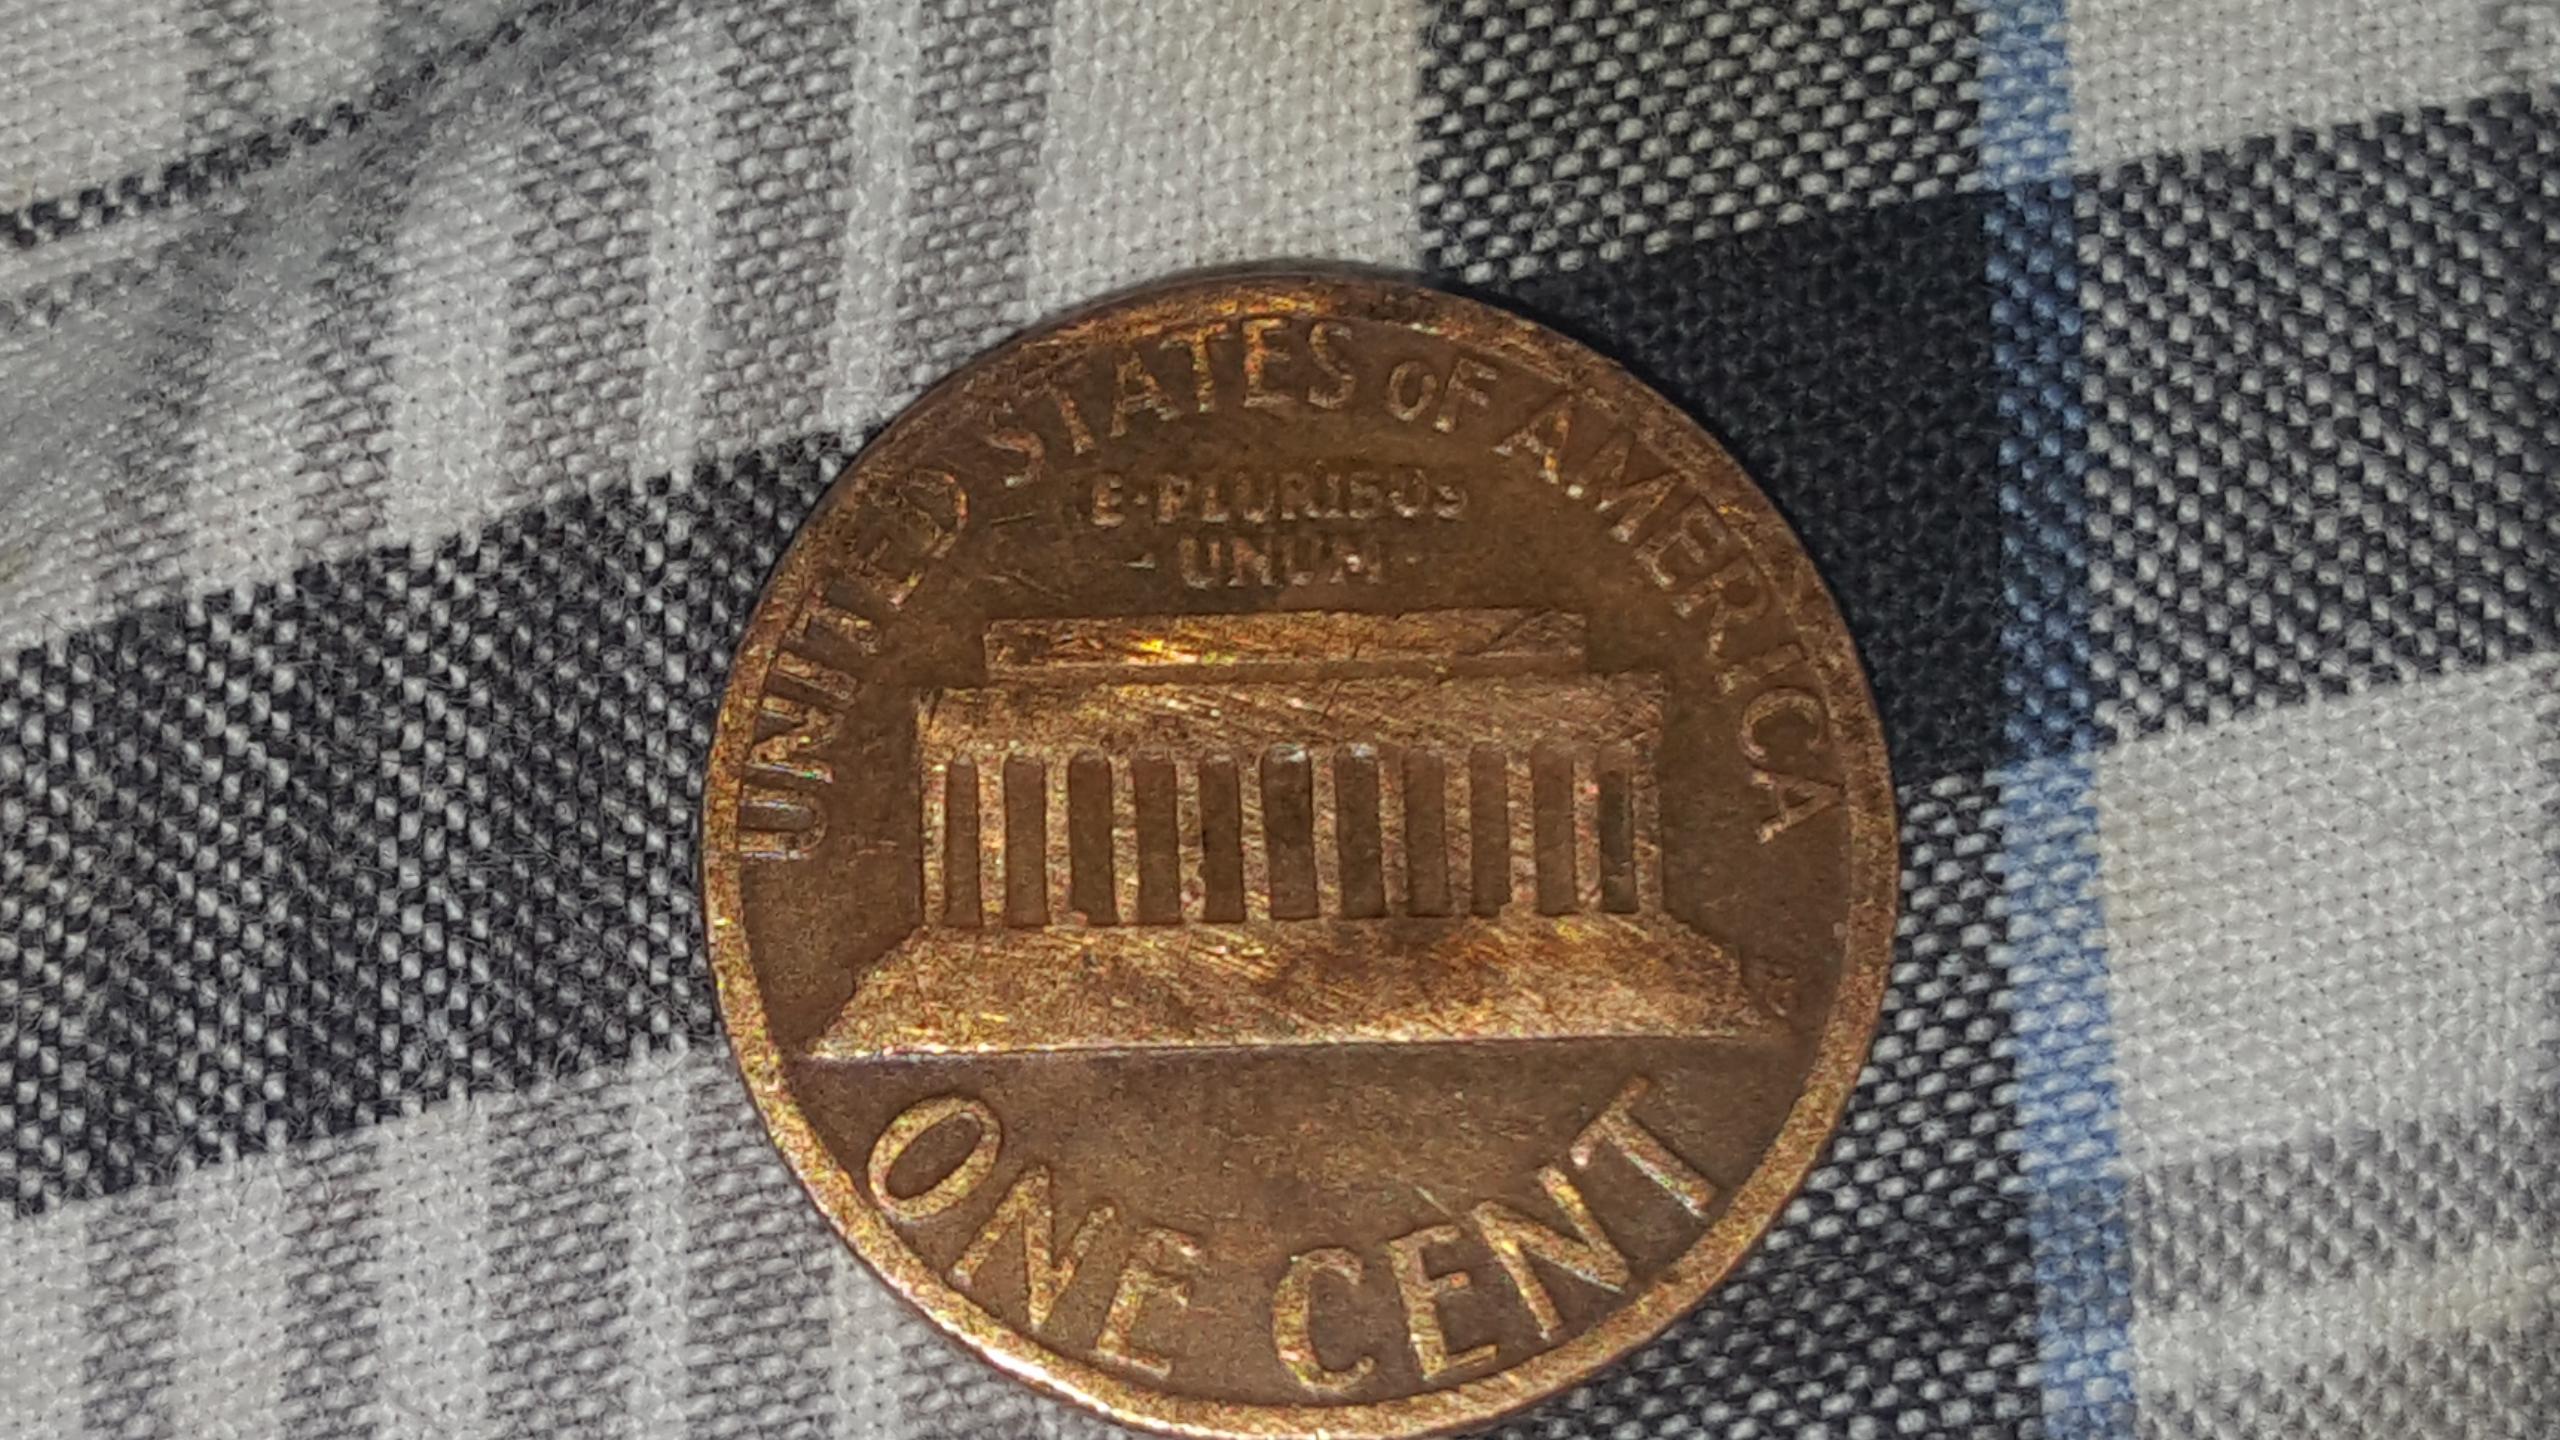 100+ 1977 D Penny Double Die – yasminroohi